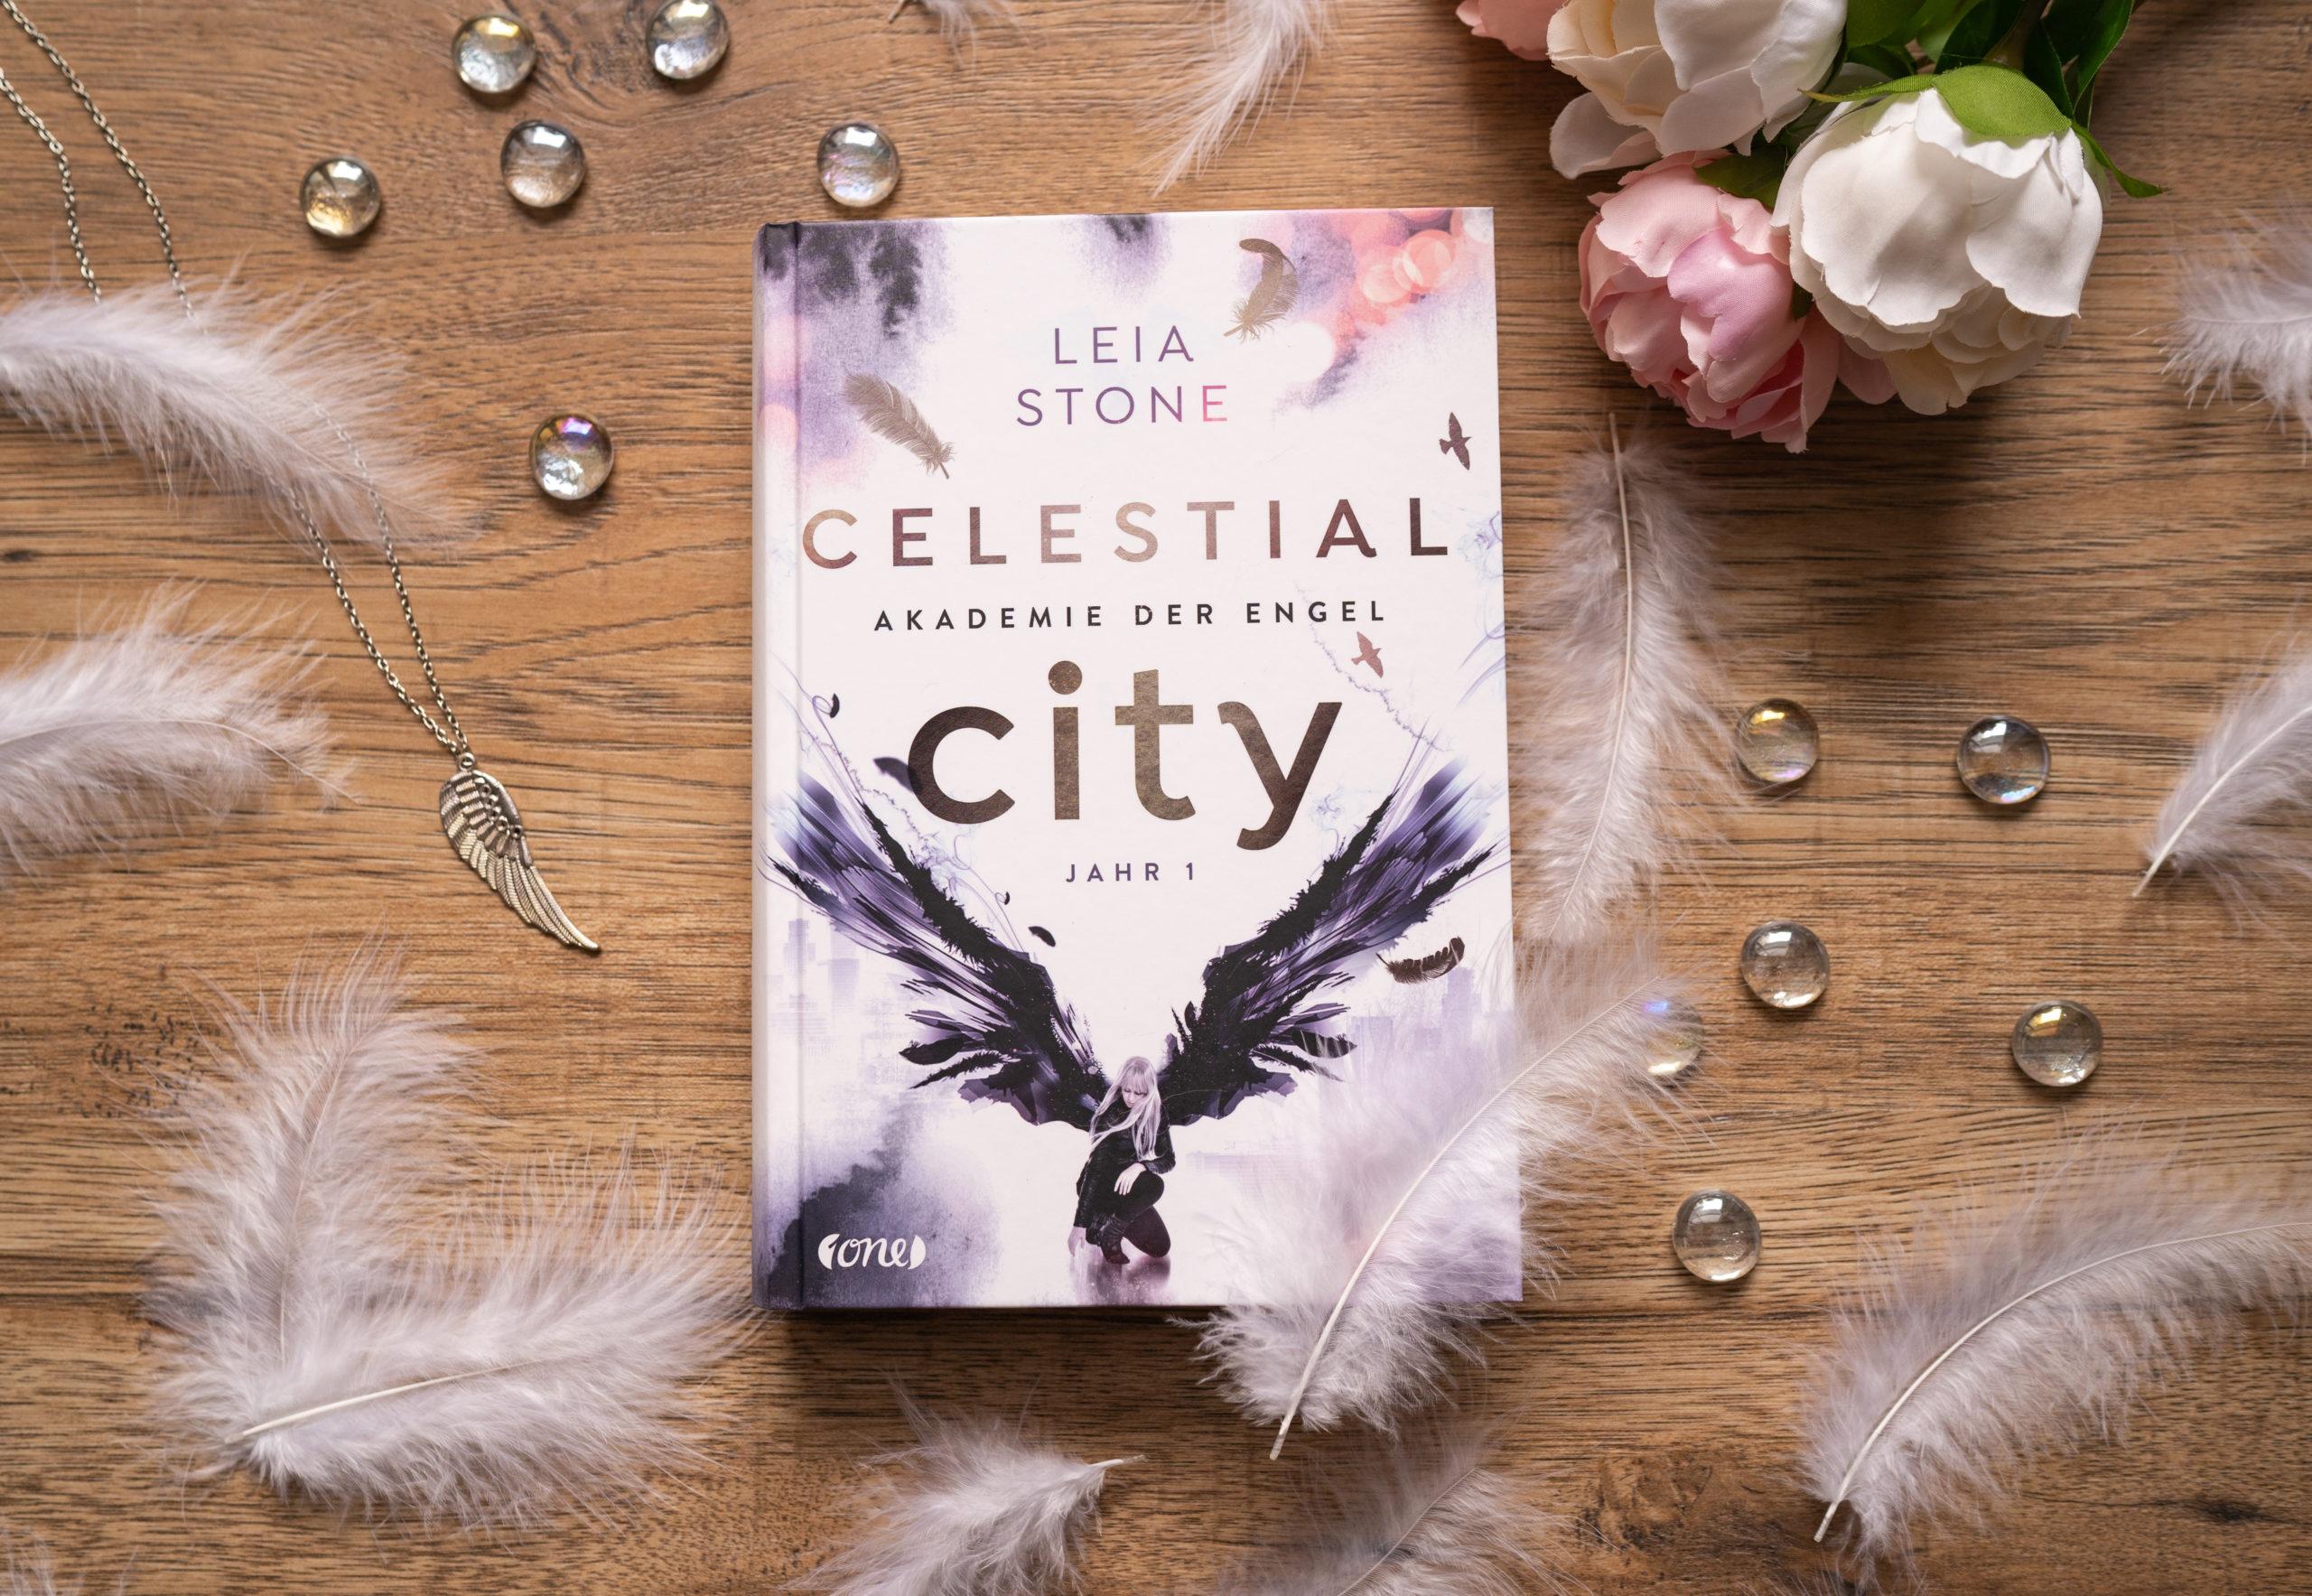 Celestial City: Akademie der Engel 1 – Leia Stone graphic